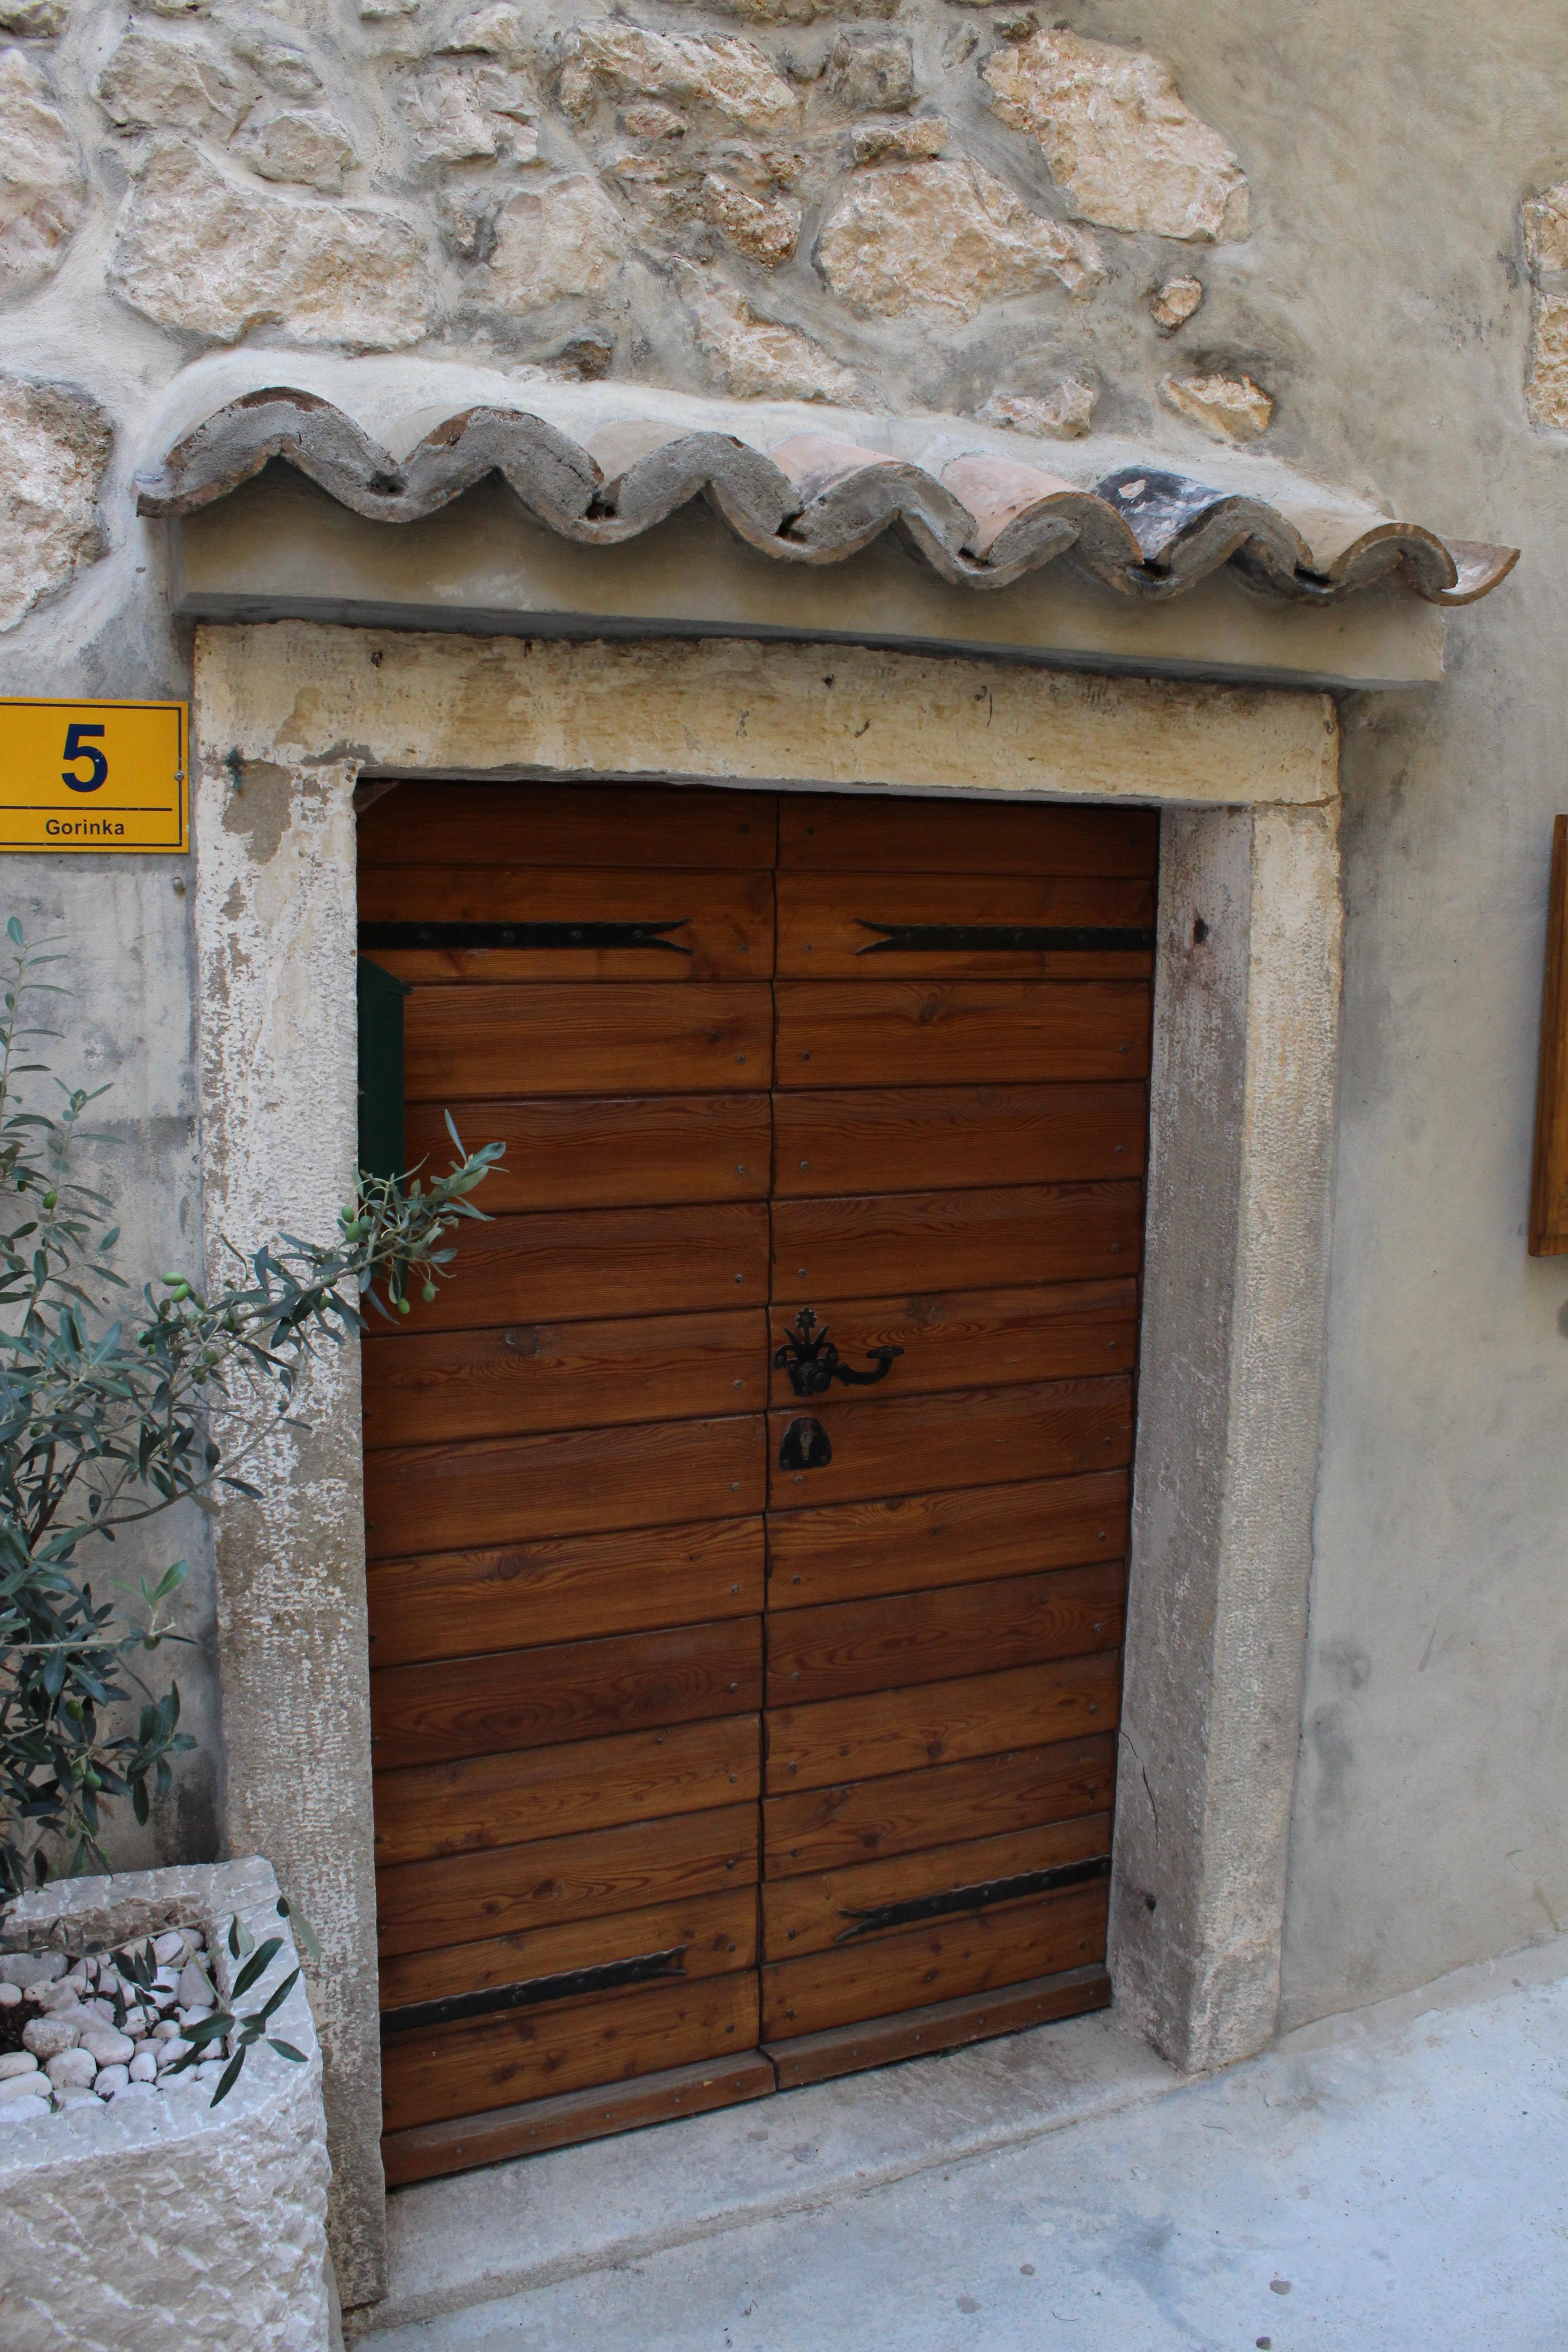 Fotos gratis madera ventana edificio fachada port n - Puertas de madera para entrada principal ...